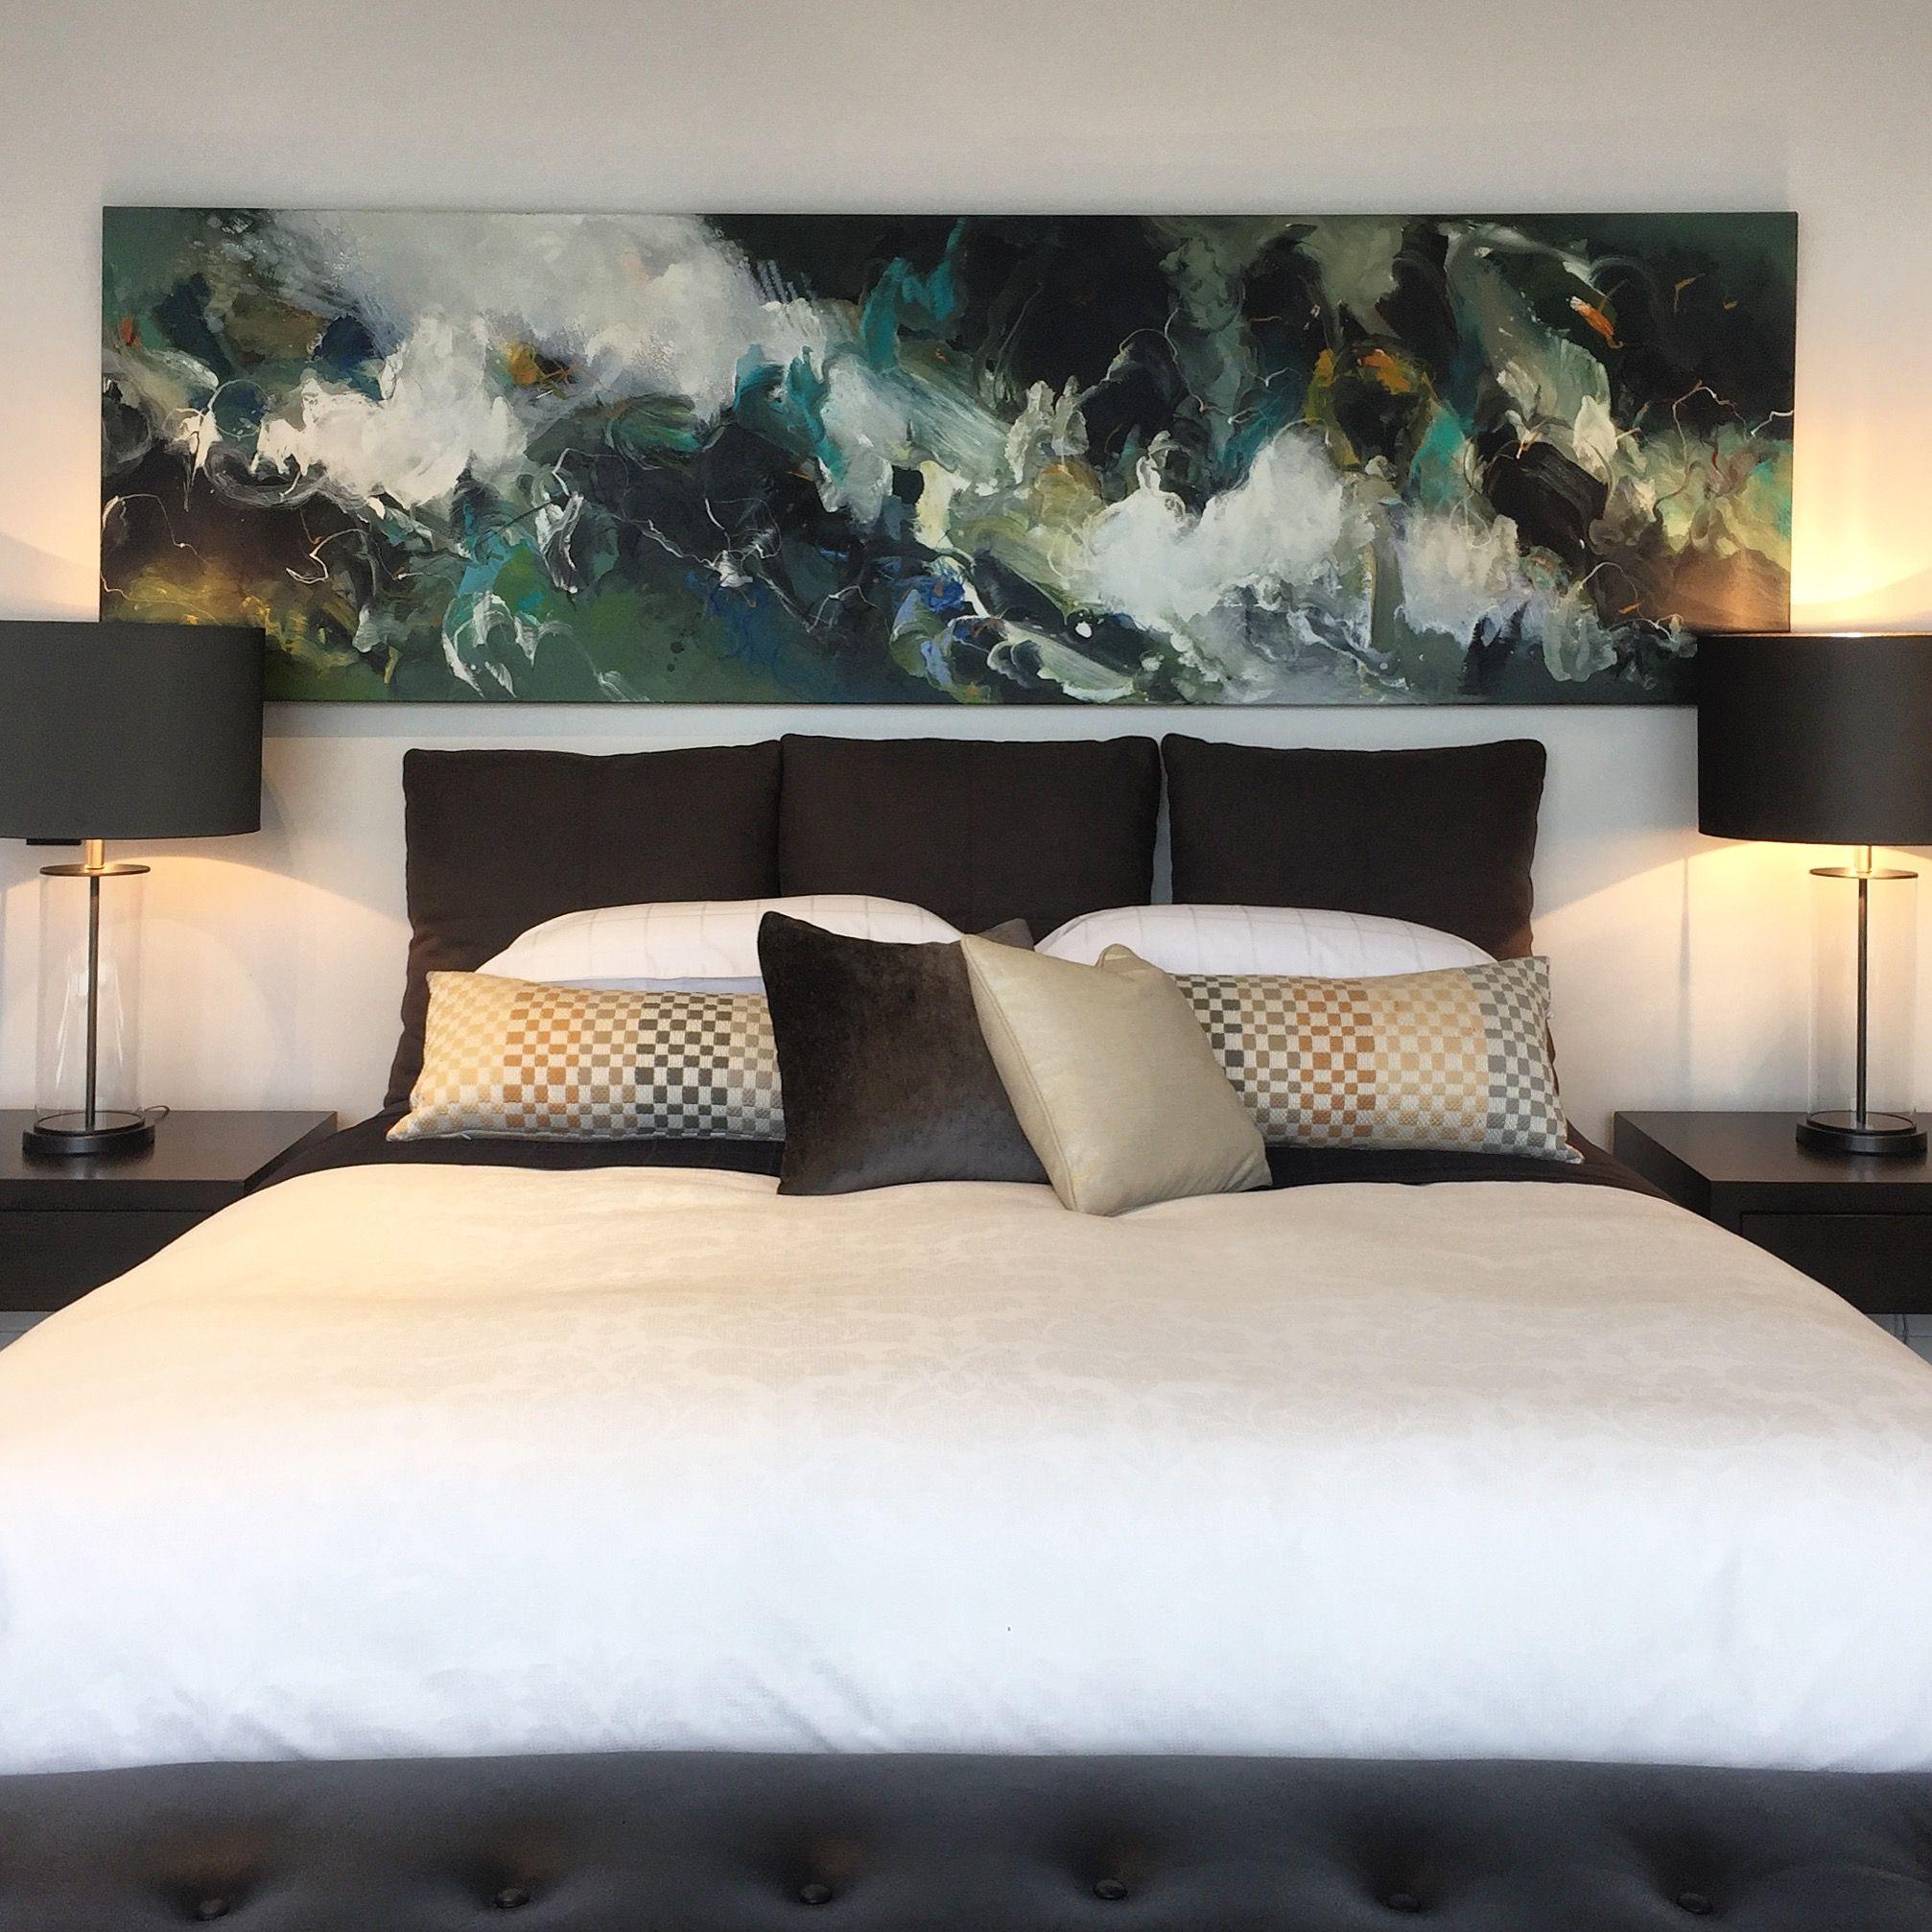 Bedroom decor by Lisa Gole Interiors Australia